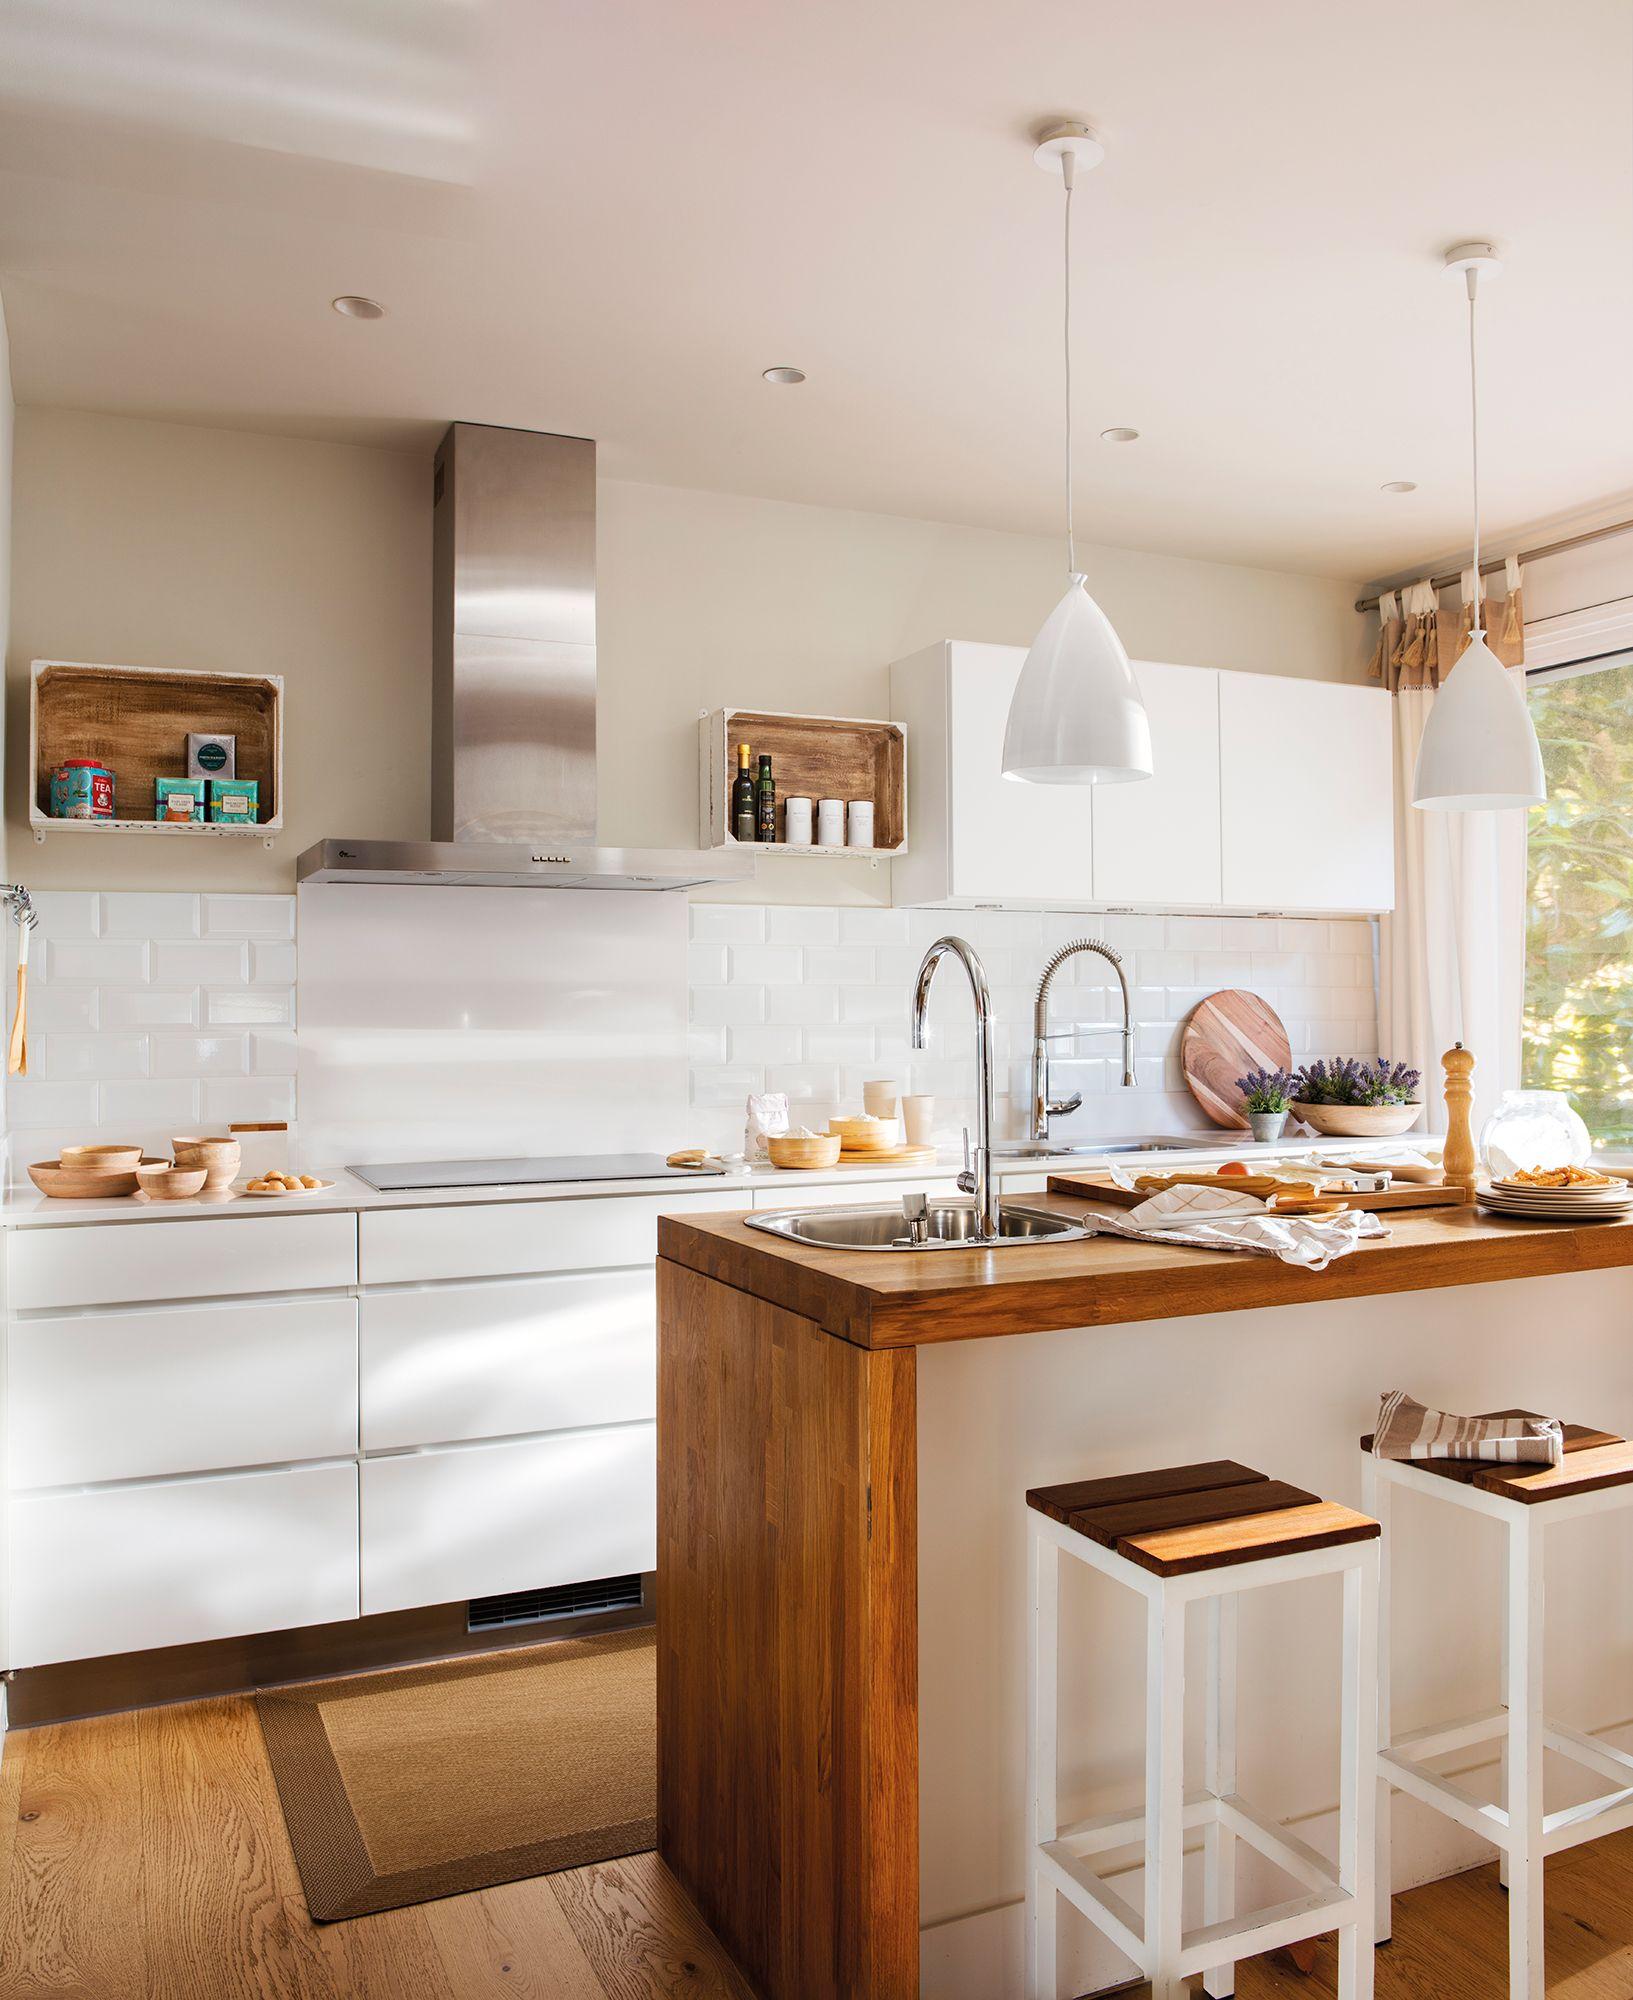 Cocina con muebles en blanco e isla central_ 00446978 | Blanco ...